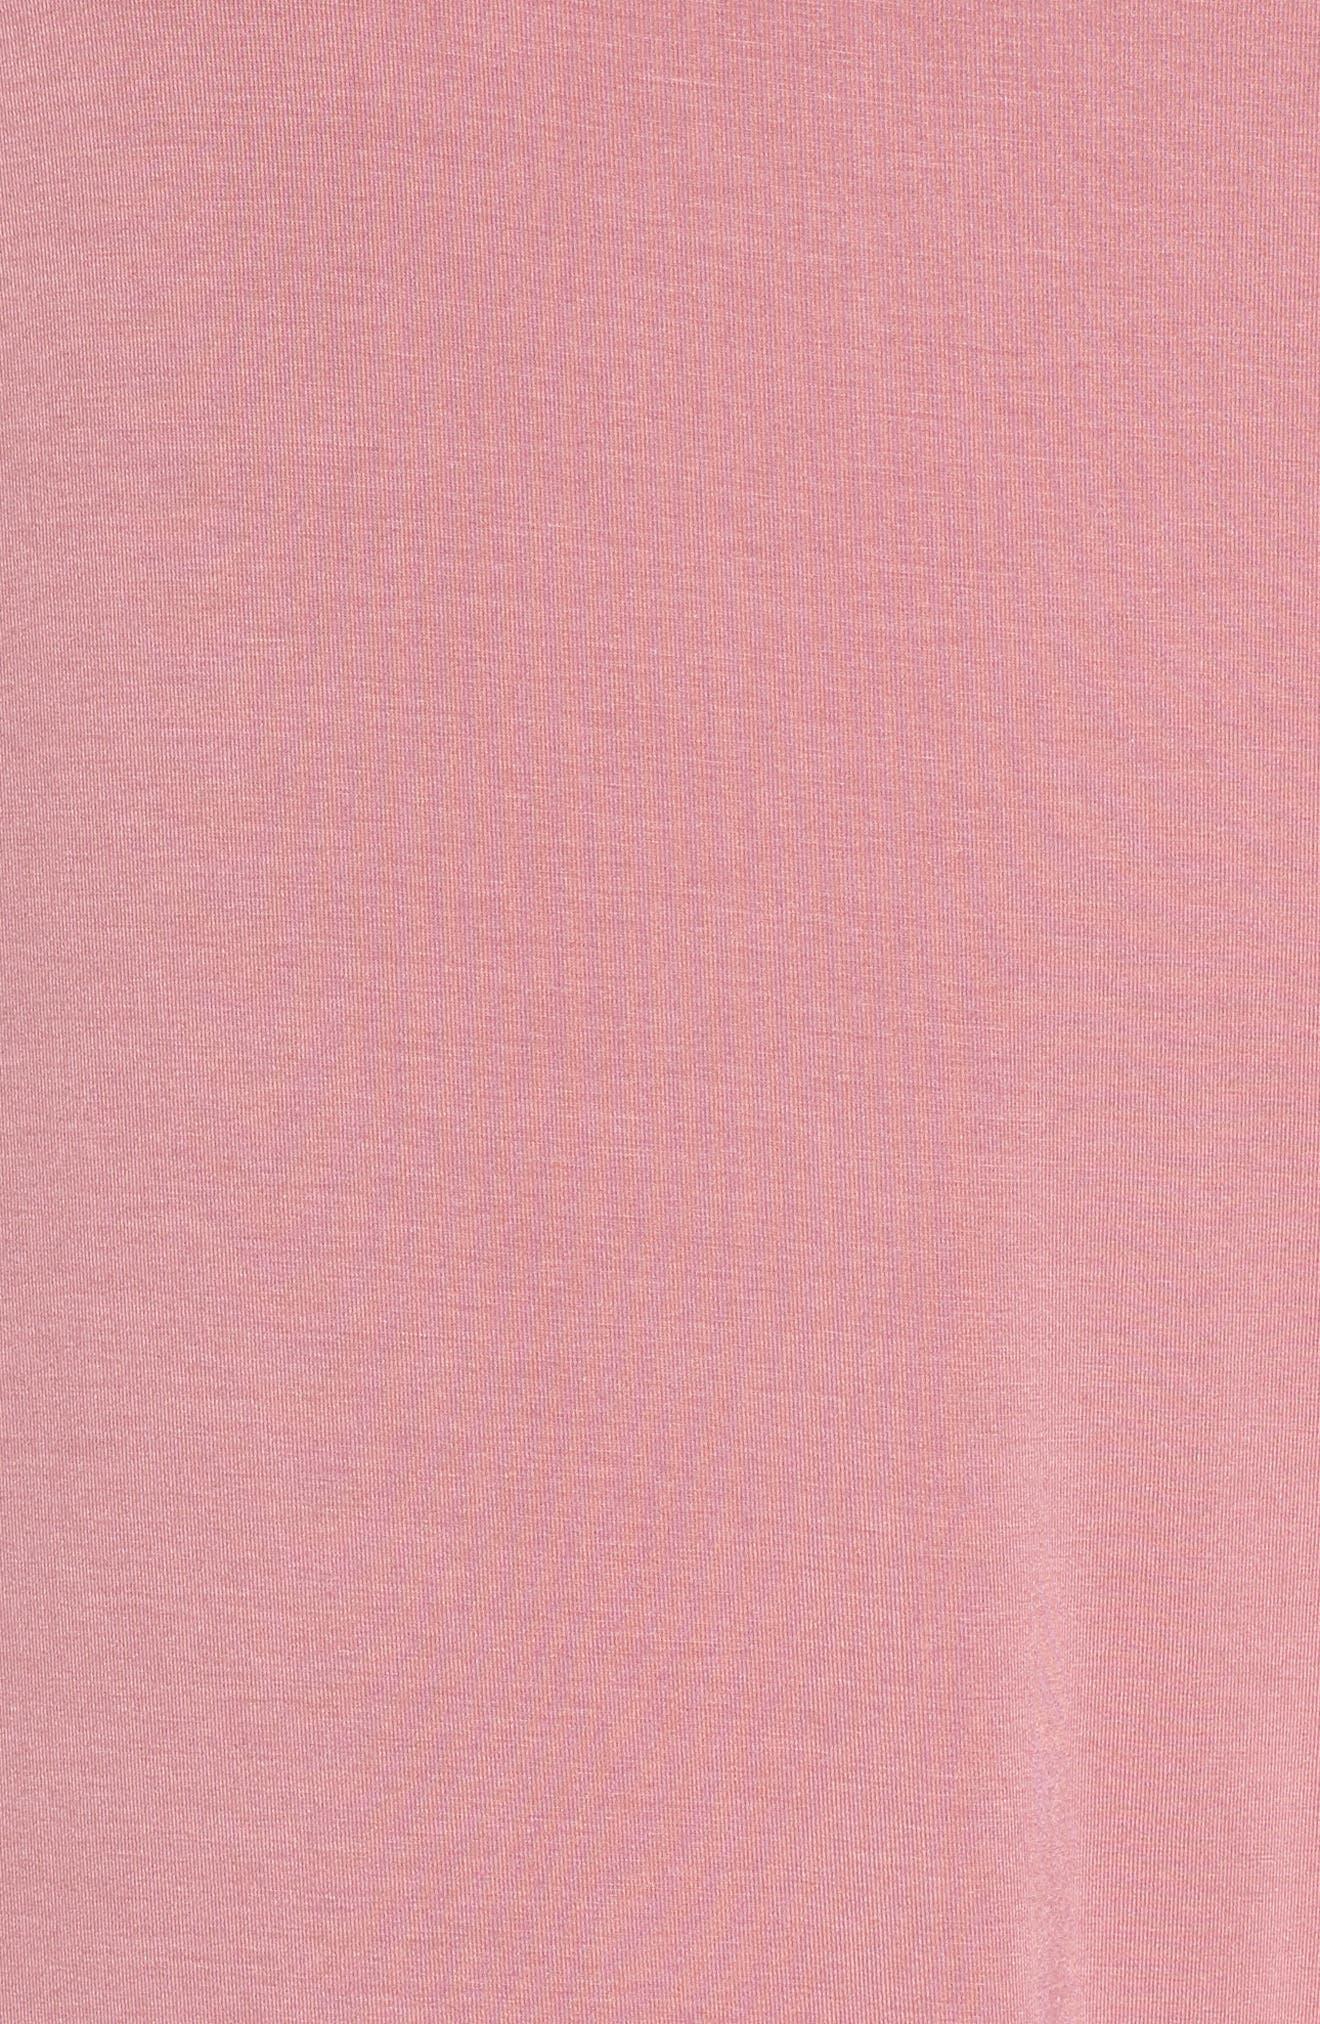 Dolman Sleeve Nightshirt,                             Alternate thumbnail 19, color,